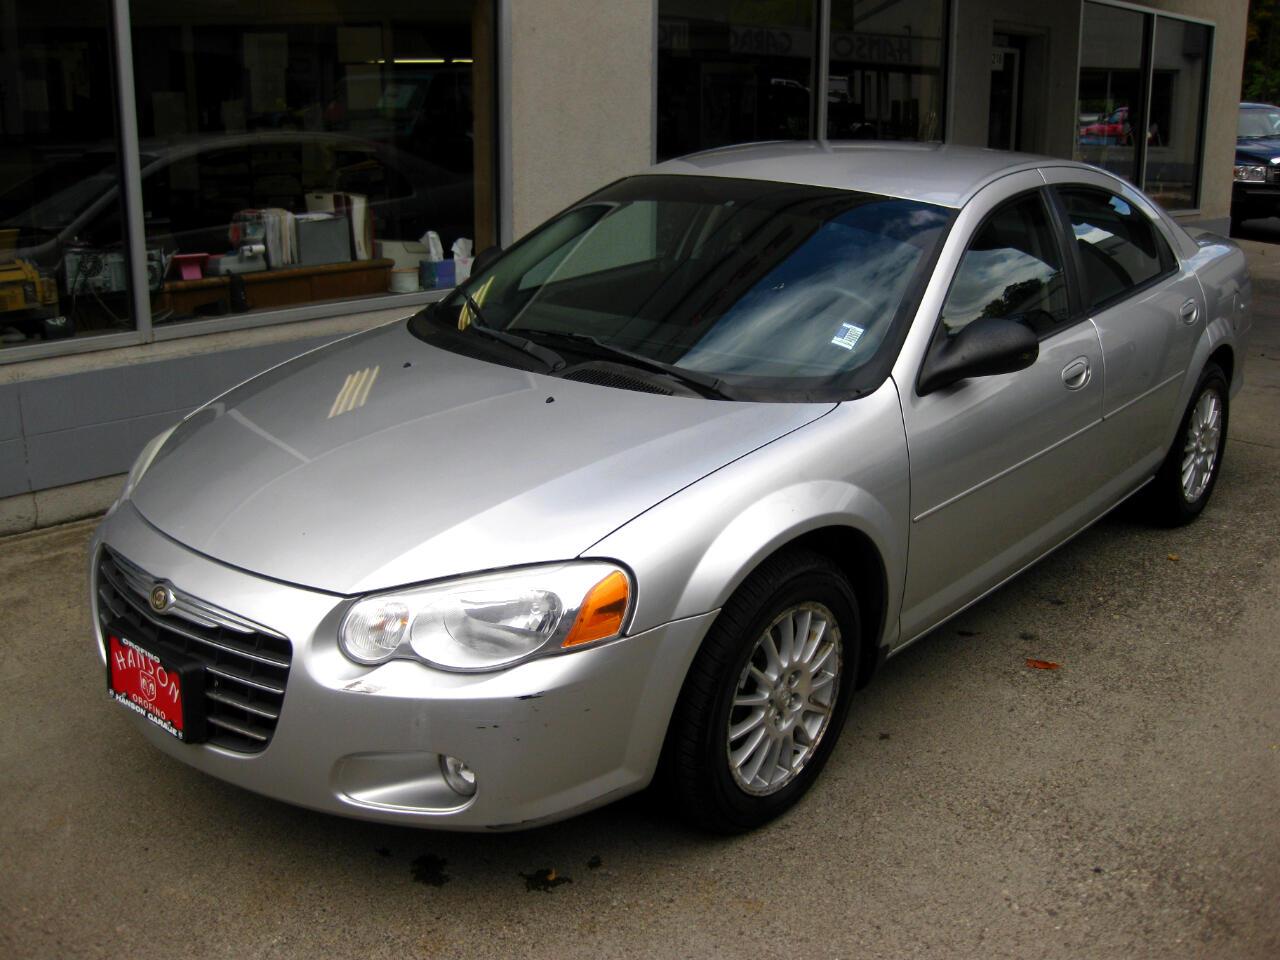 2004 Chrysler Sebring 2004 4dr Sdn LXi